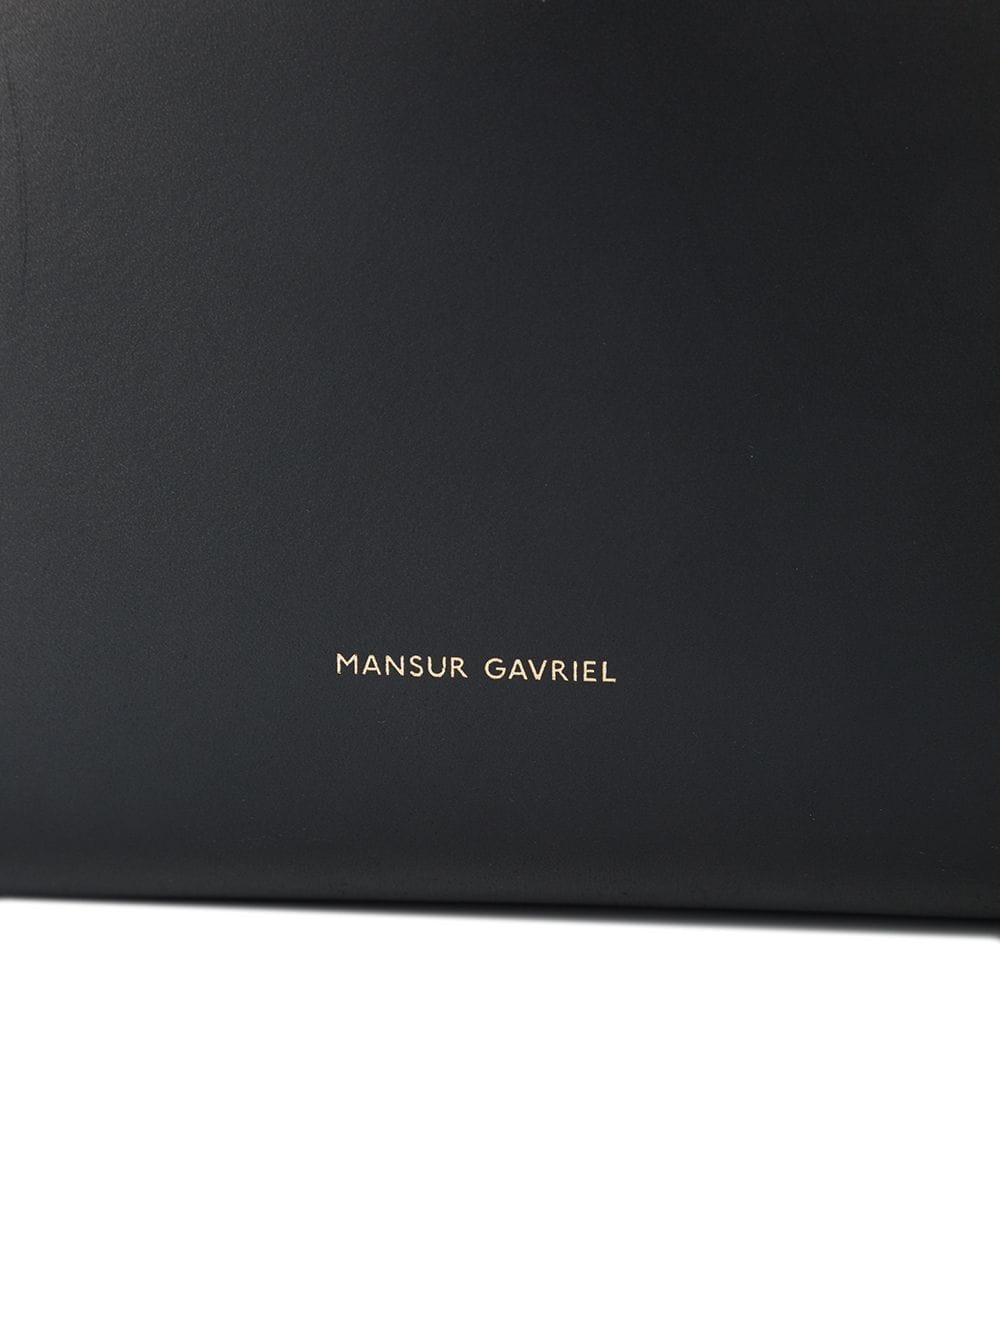 Mansur Gavriel Leather Bucket Bag in Black